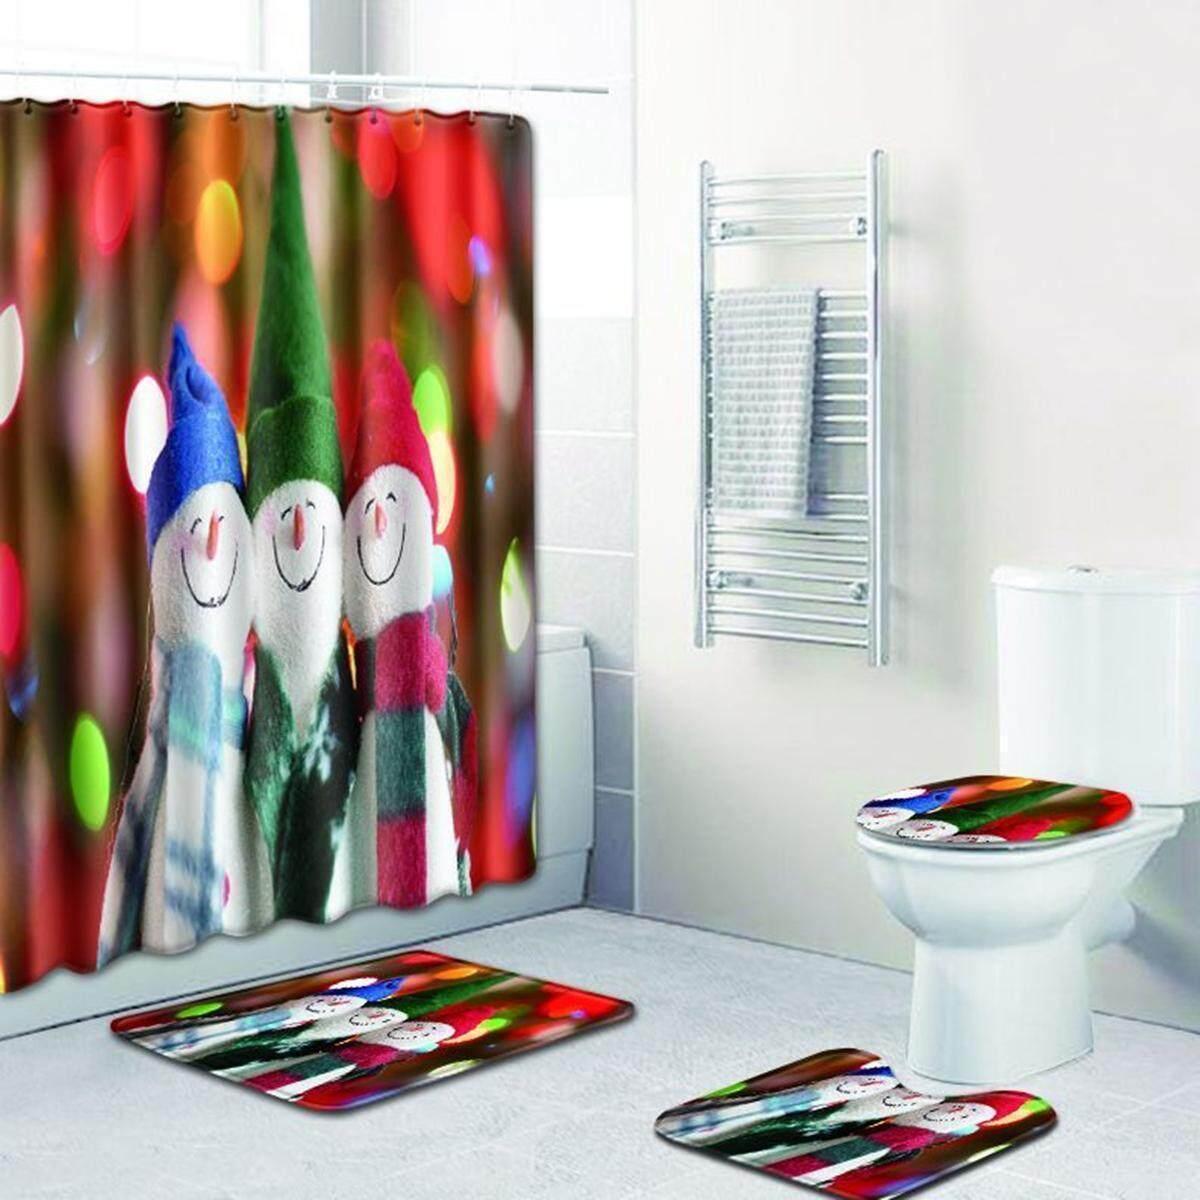 4pcs Bath Mat Set Non Slip Rug Bathmat Toilet Shower Floor Curtain Cover Xmas Modren Cactus Bathroom Curtain Polyester Waterproof Shower Curtain Set